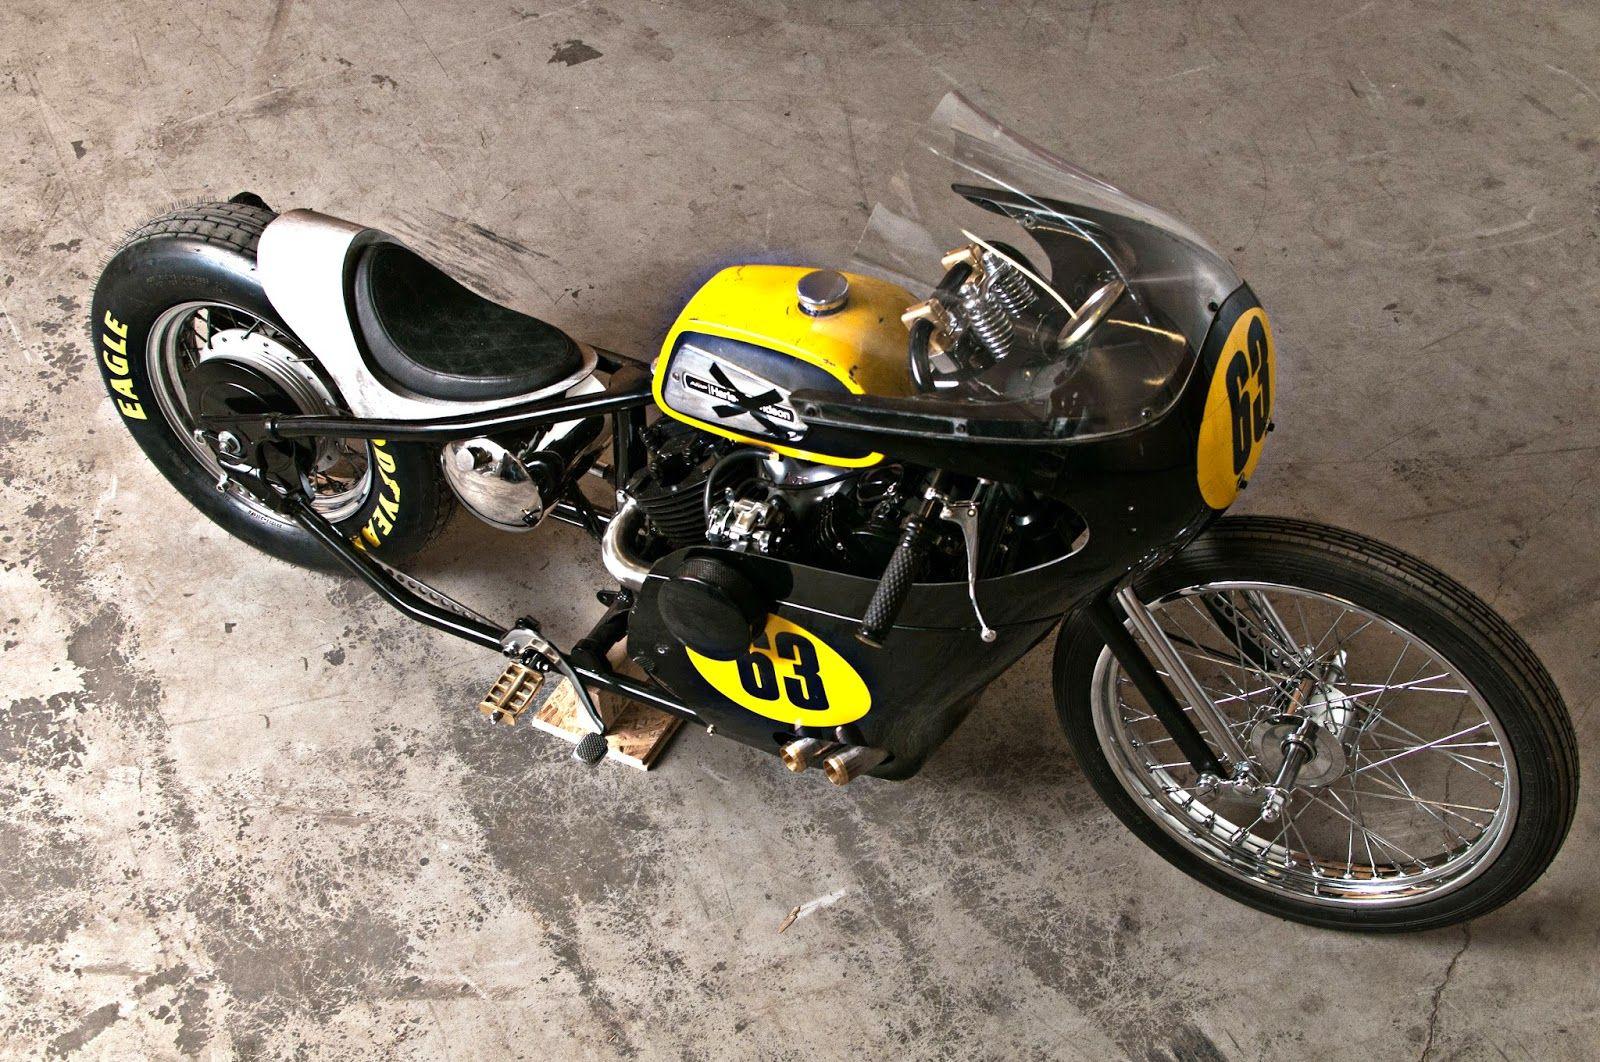 yamaha xvs 650 drag star 1997 by mademenbikes motorcycles. Black Bedroom Furniture Sets. Home Design Ideas